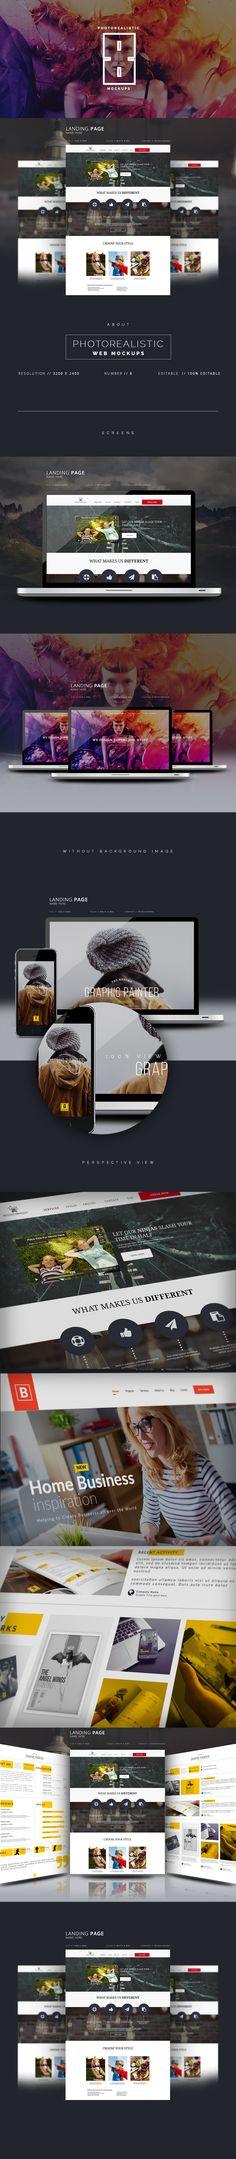 Website Display Mockup on Behance